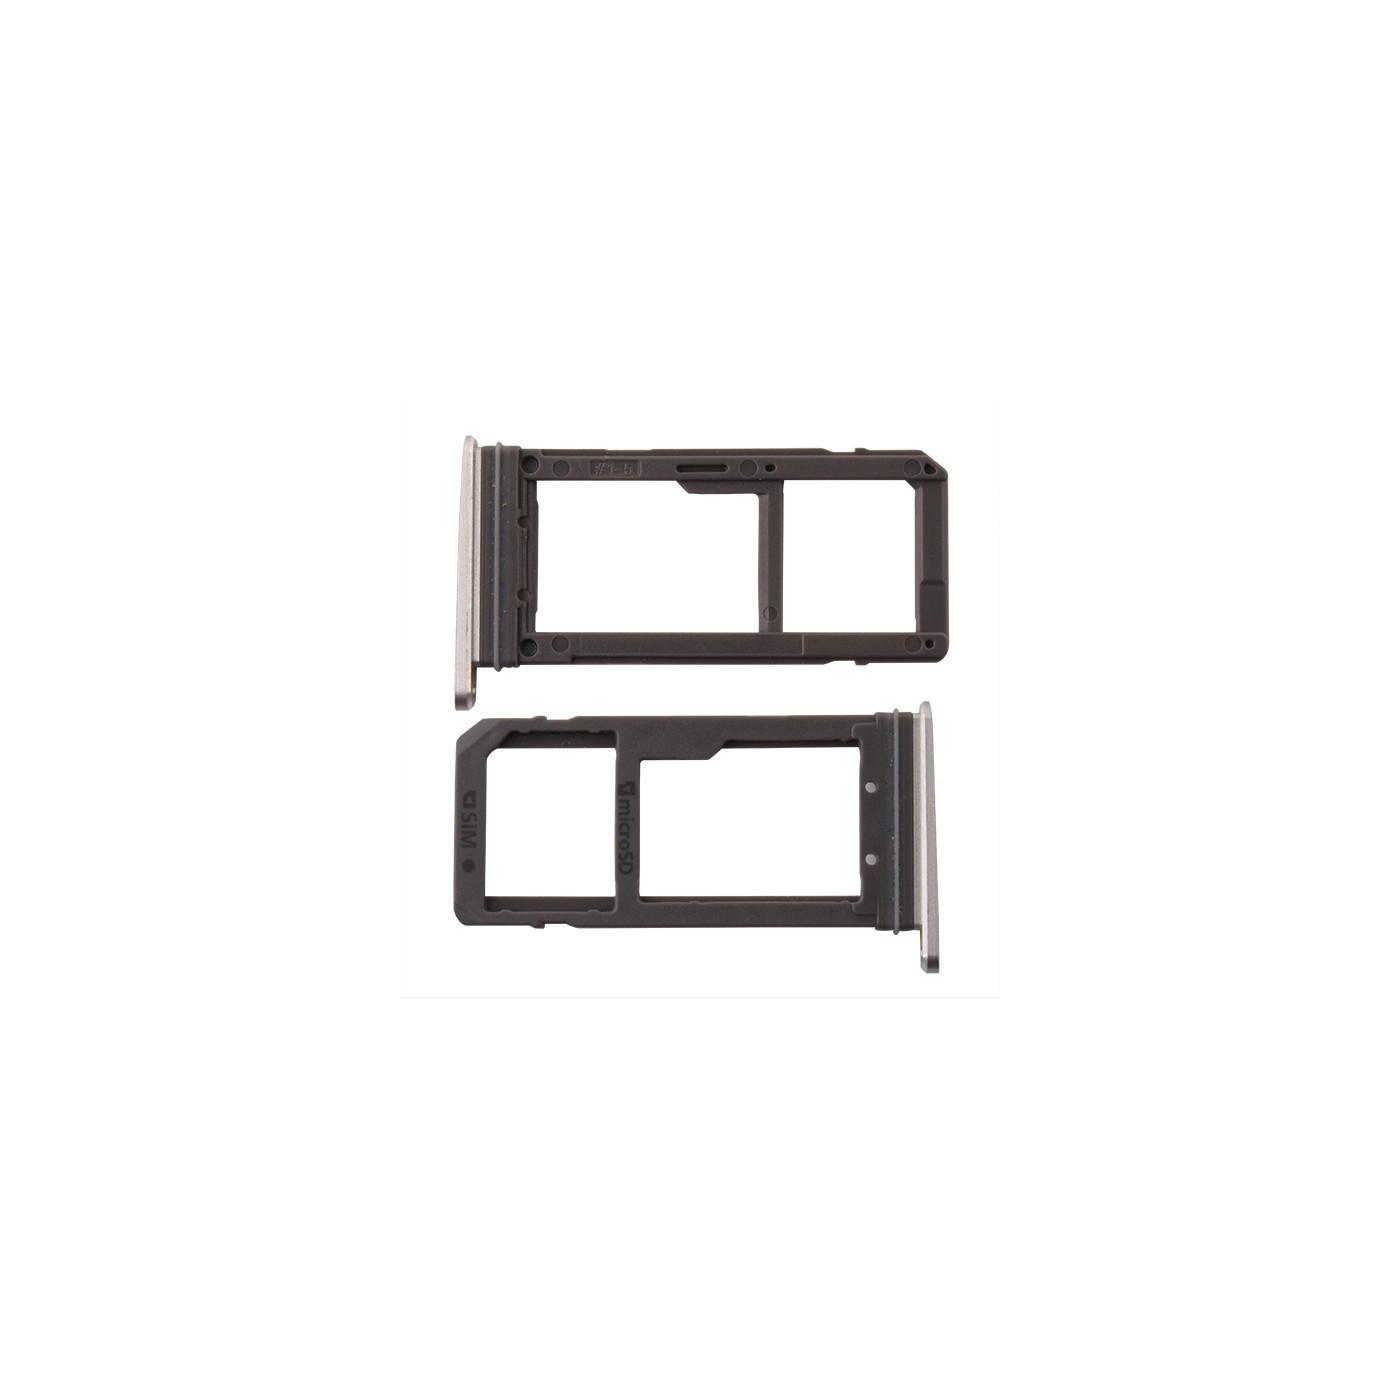 Porta sim card micro SD Black Samsung Galaxy S7 G930F parts